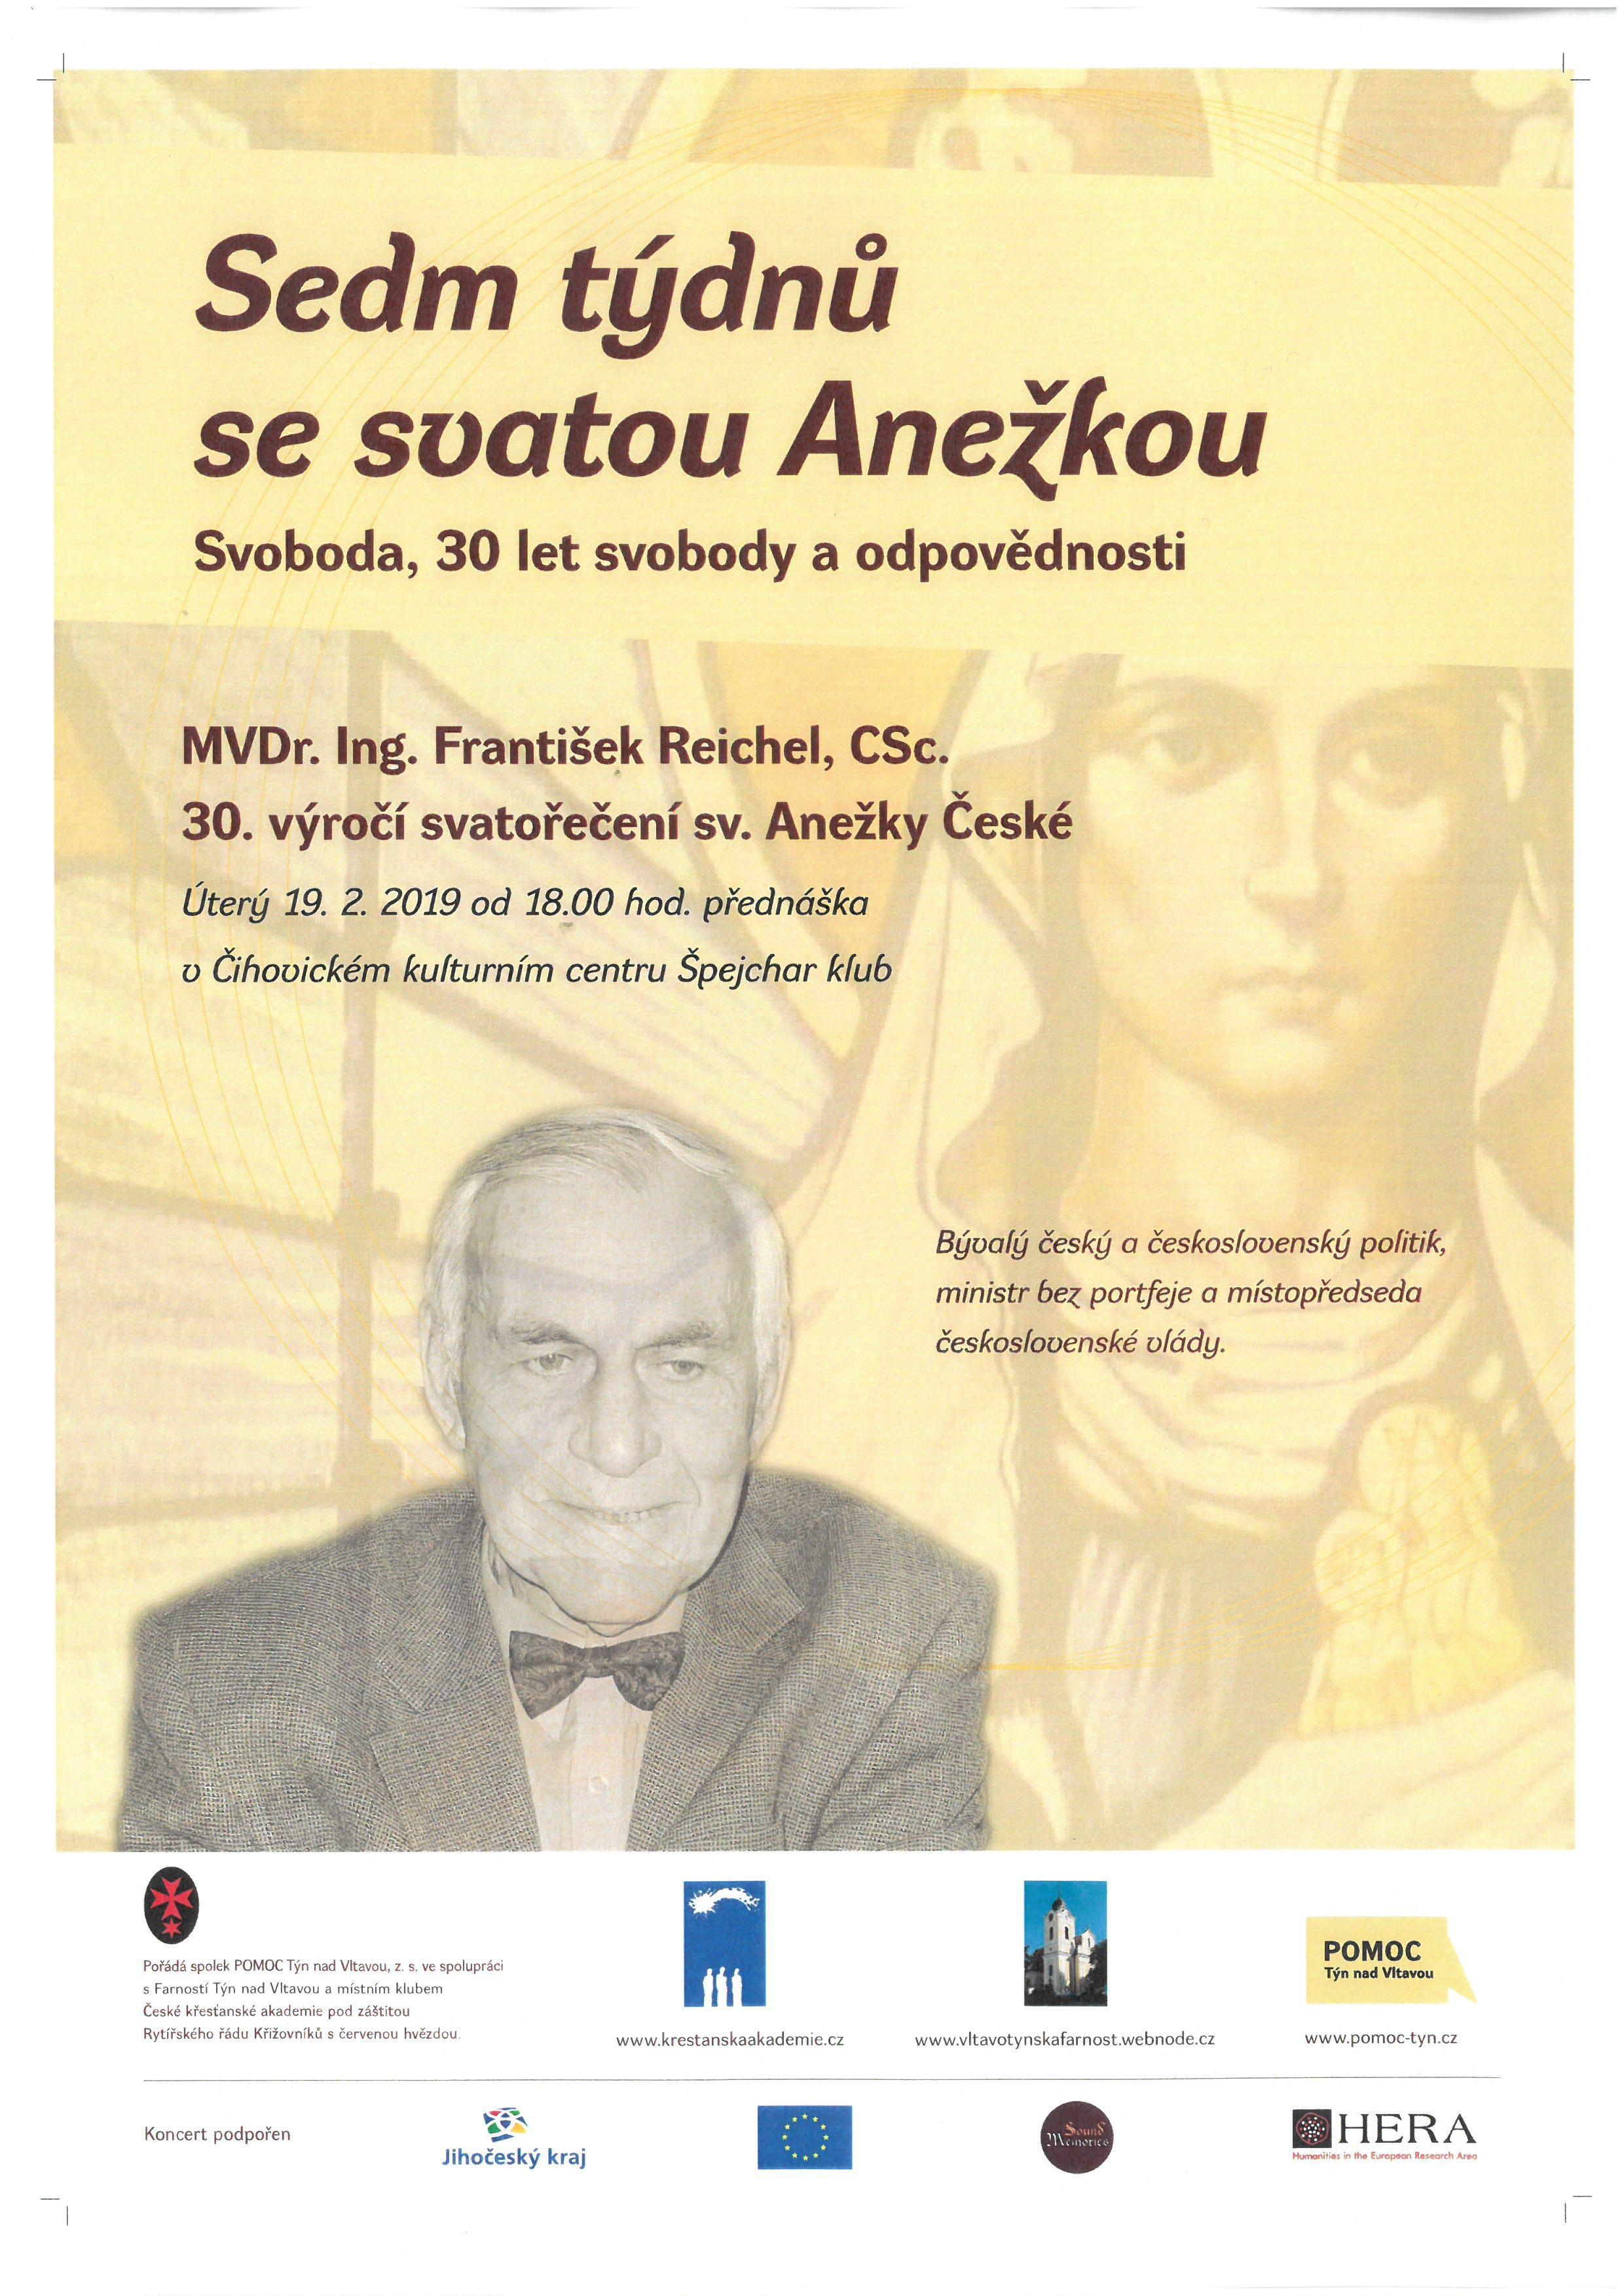 Sedm týdnů se svatou Anežkou - MVDr.Ing. František Reichel, CSc.